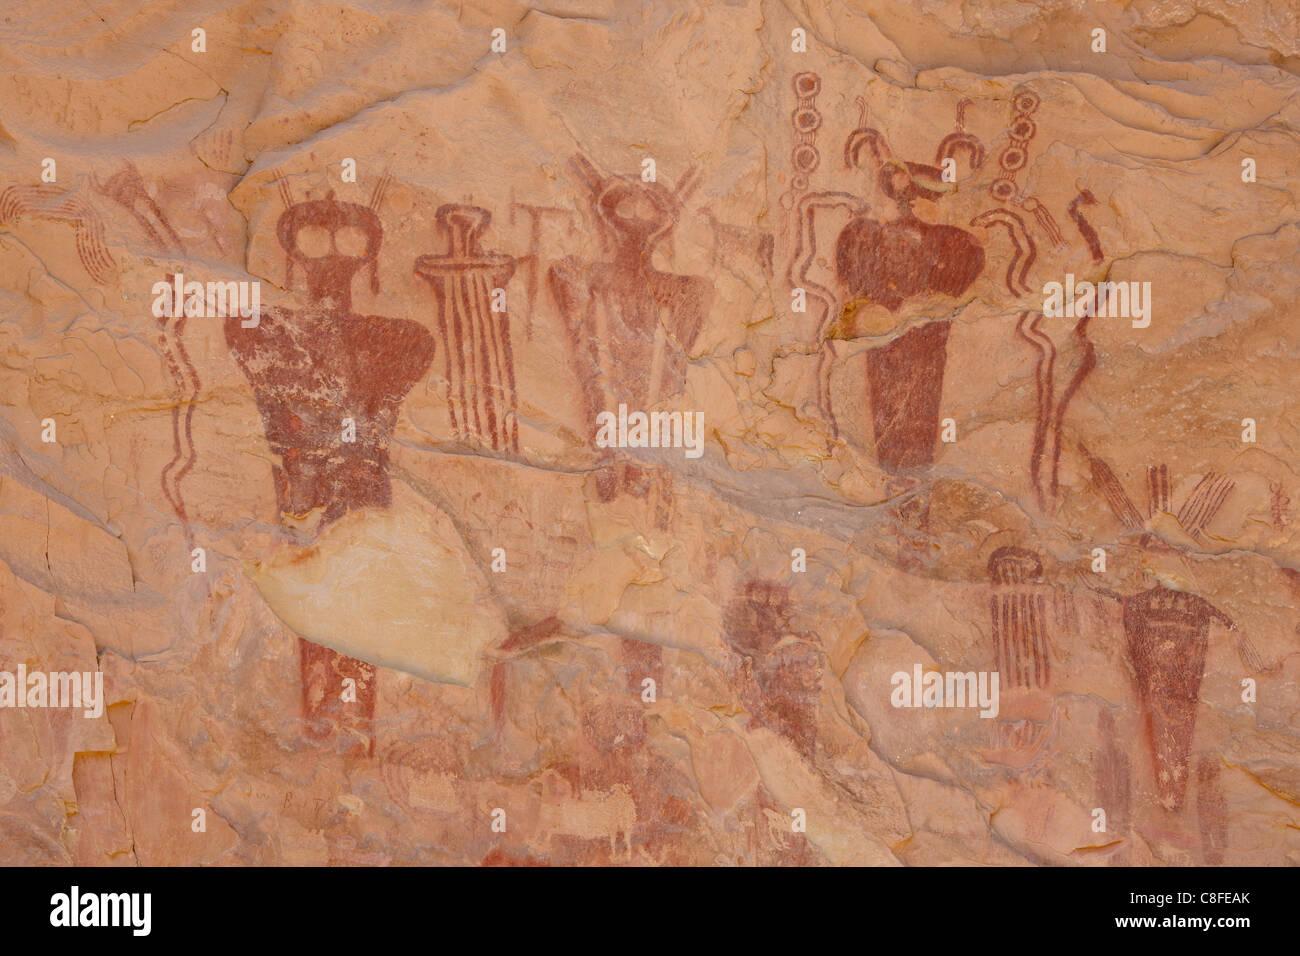 Barrier Style pictographs, Sego Canyon, Utah, United States of America - Stock Image